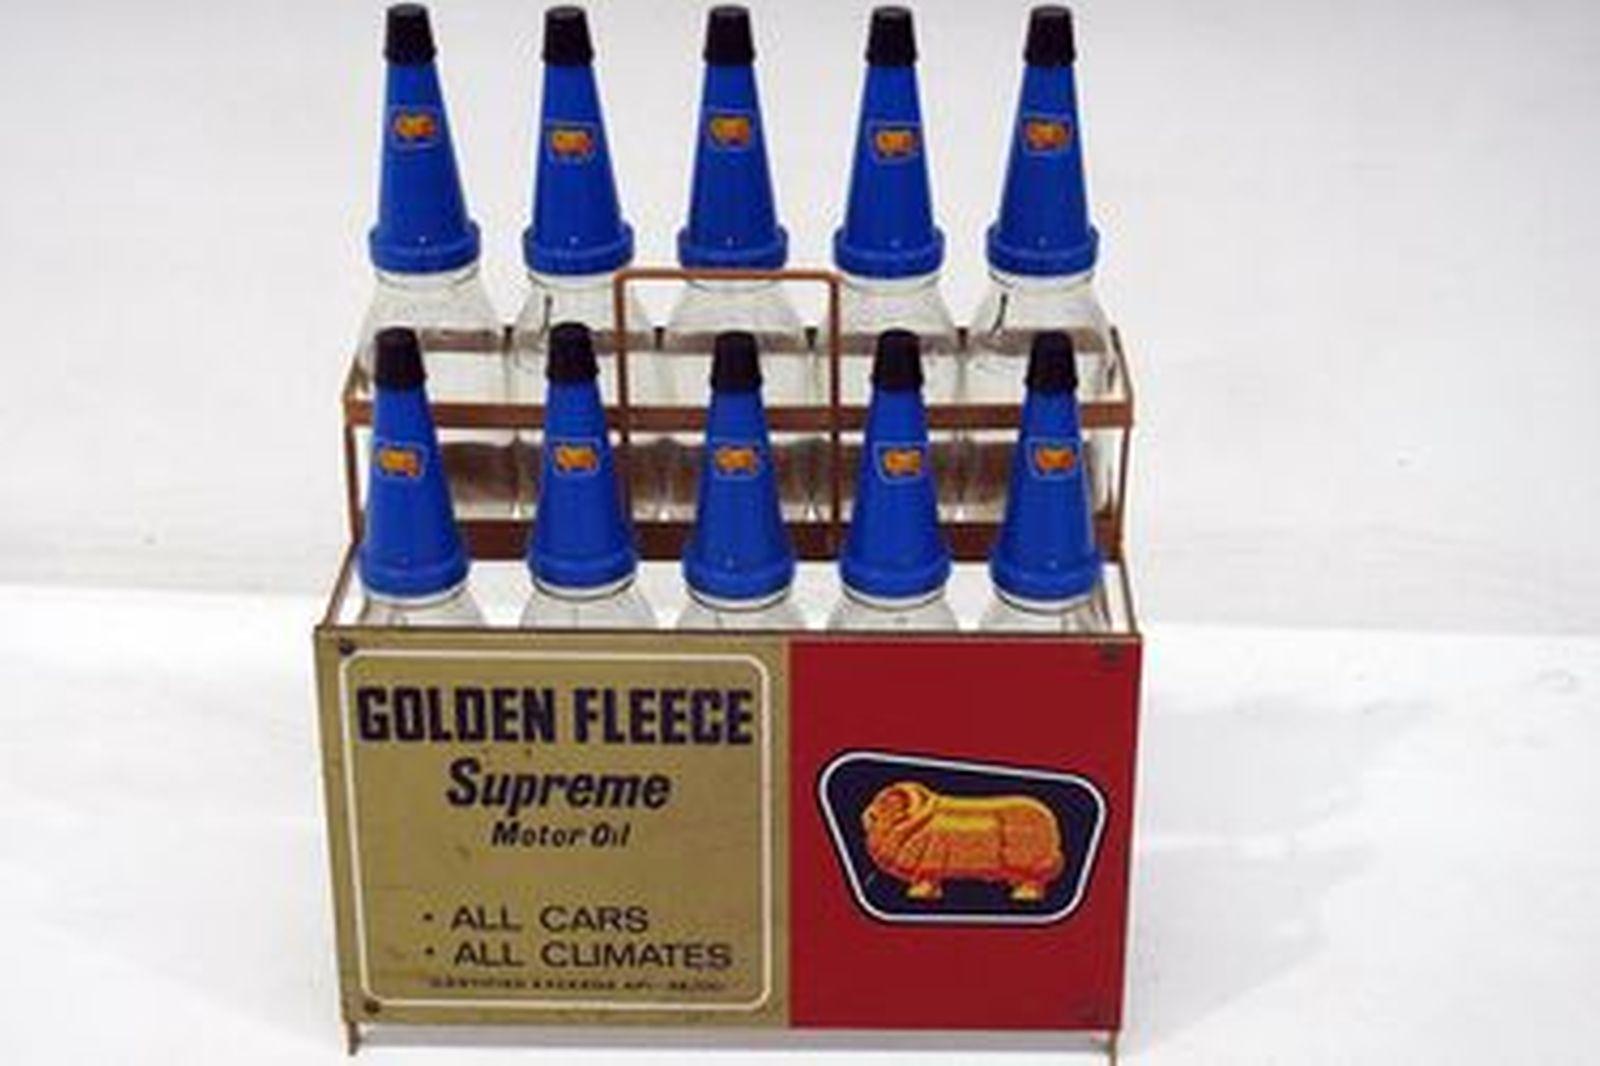 Oil Rack & Bottles -10 x bottles with tops in Golden Fleece livery